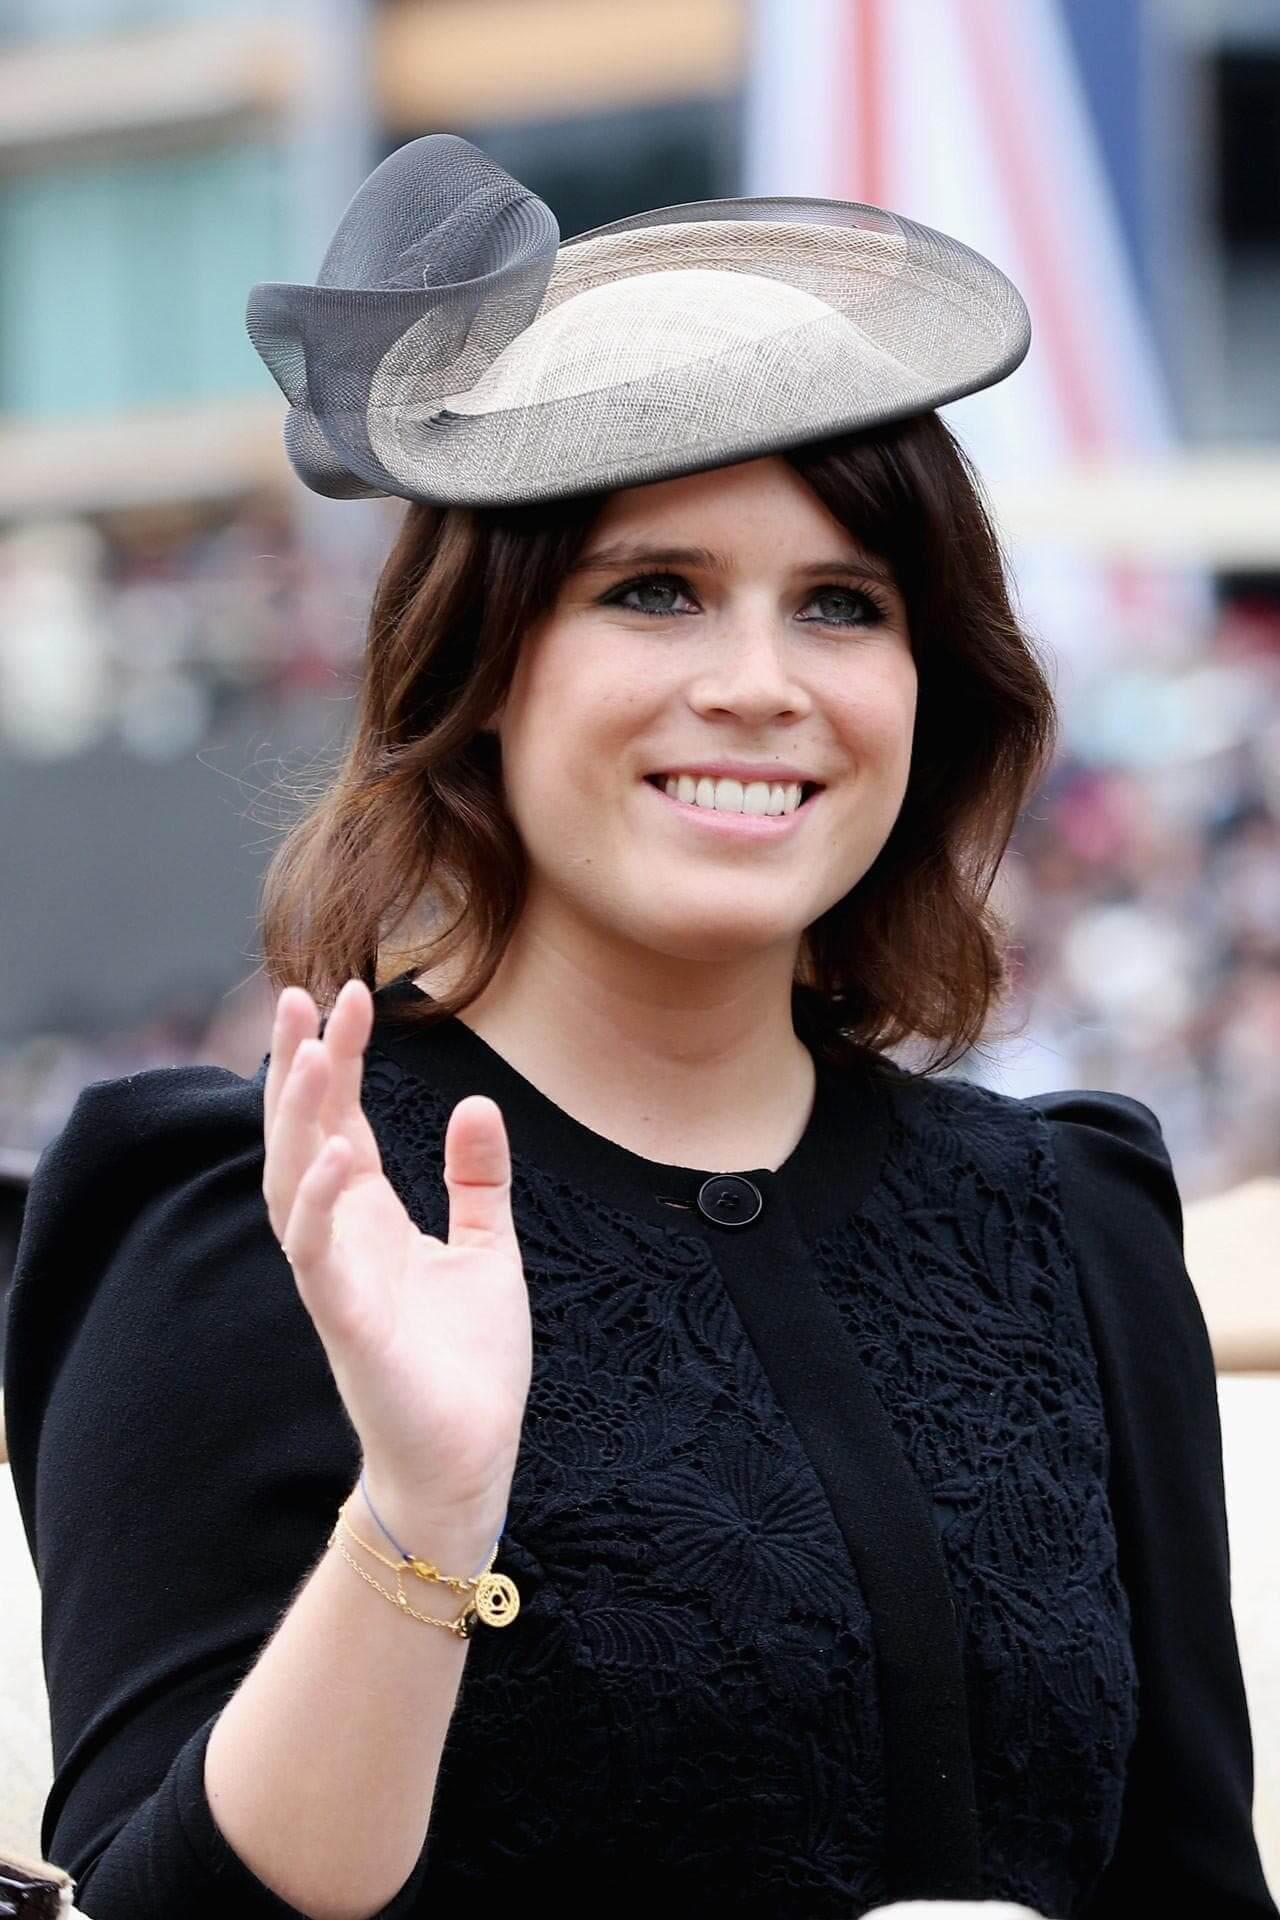 Prinsessa Eugenie